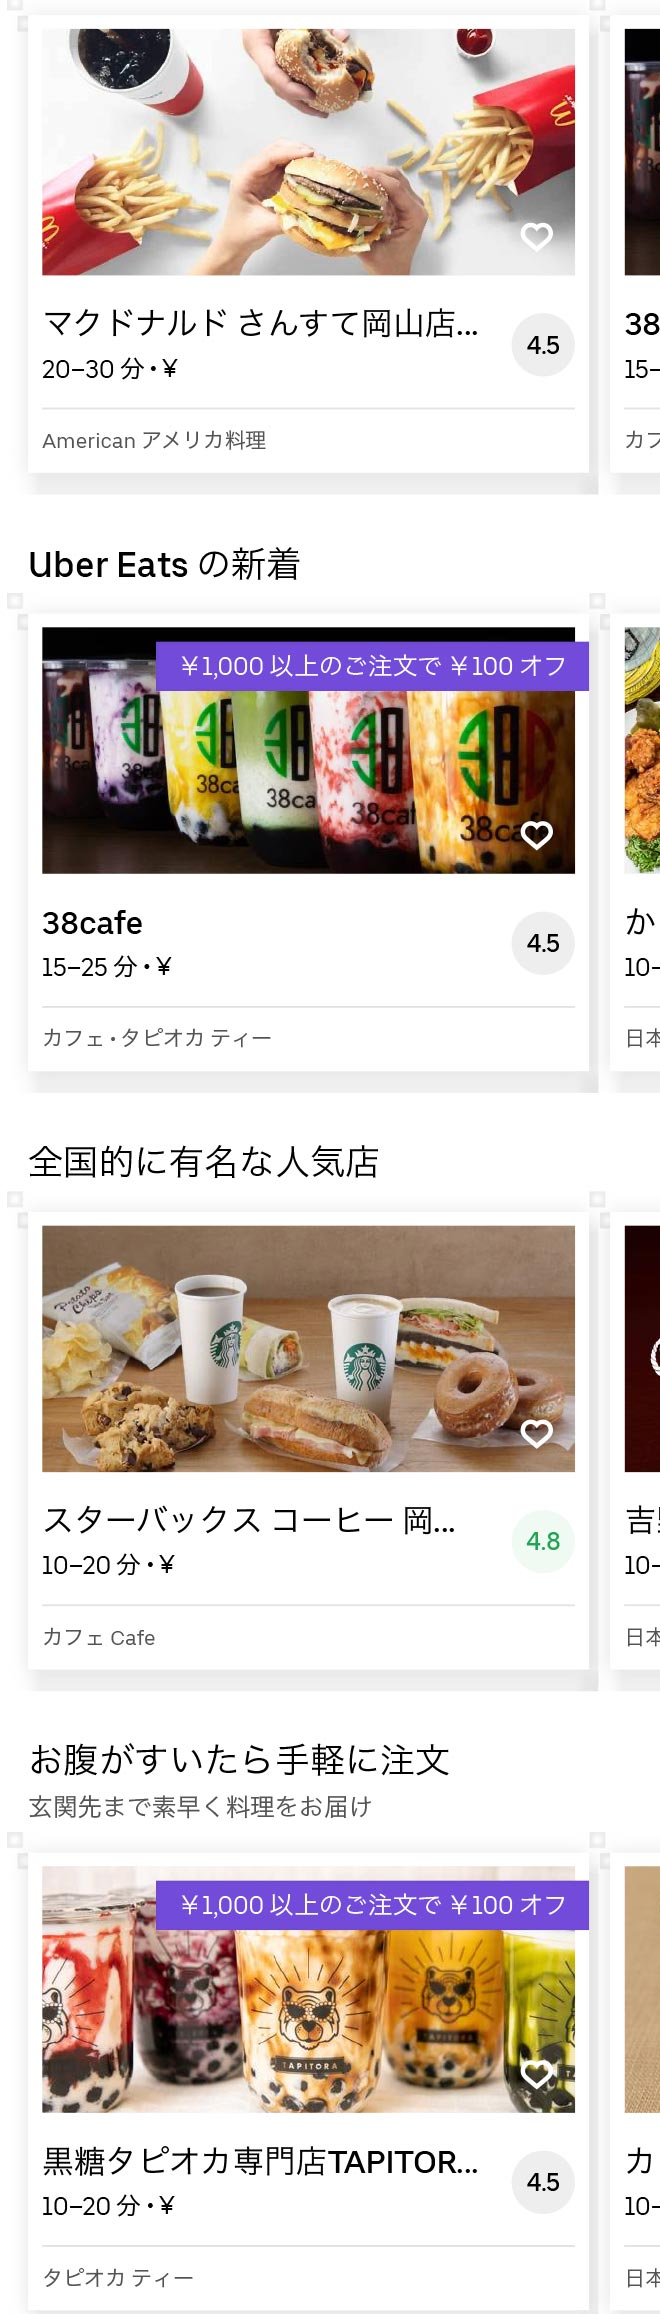 Okayama menu 2007 01